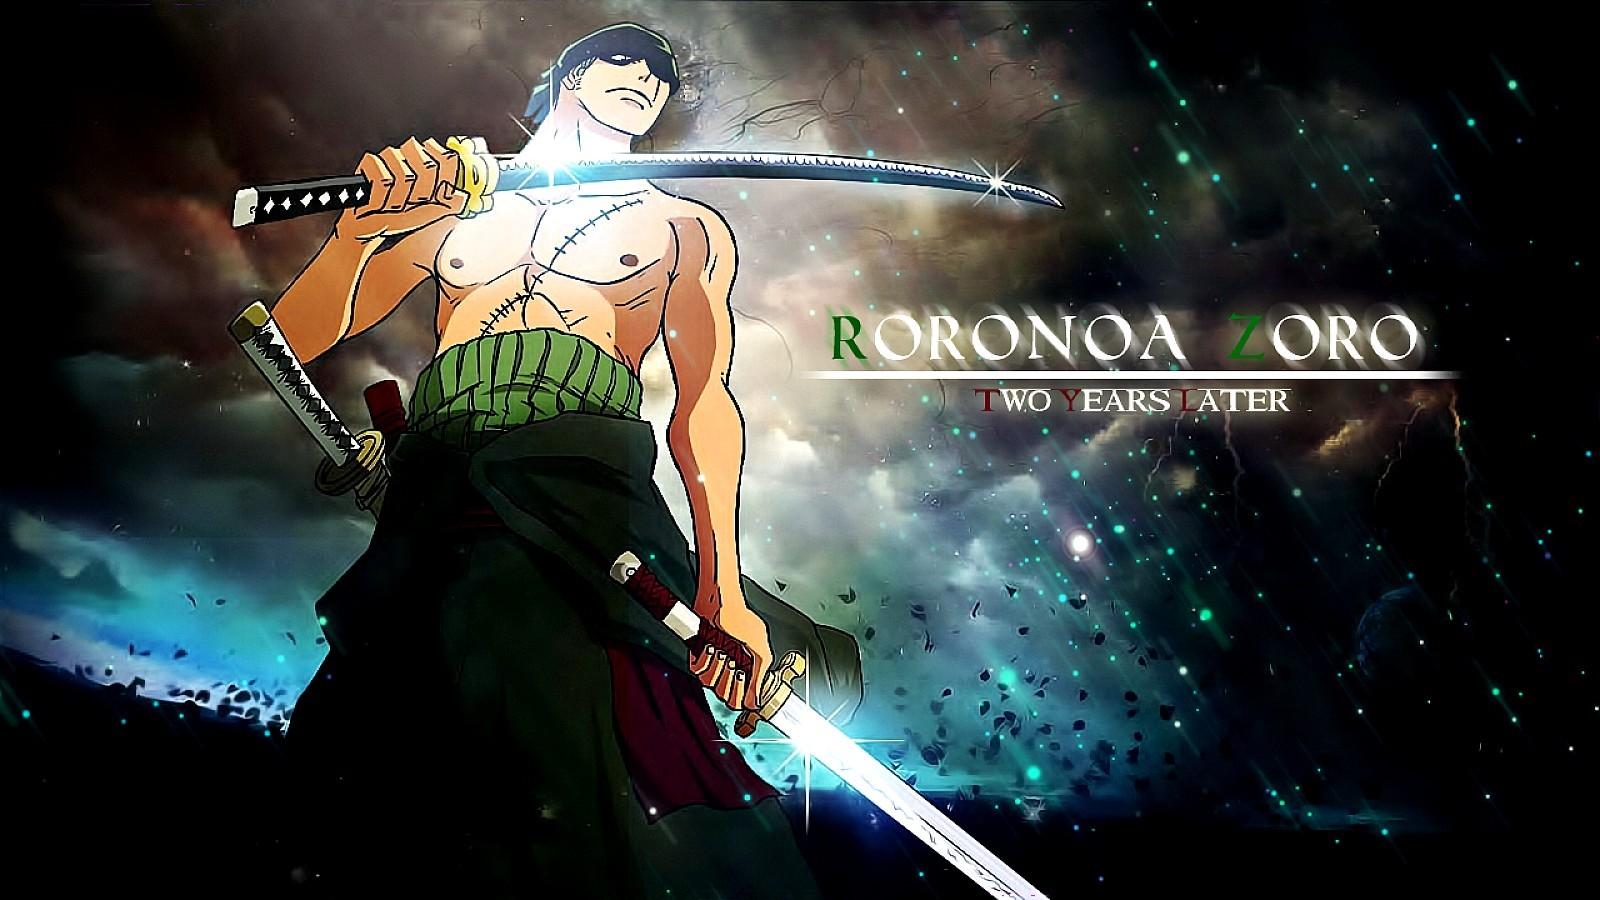 Wallpaper Anime One Piece Roronoa Zoro Midnight